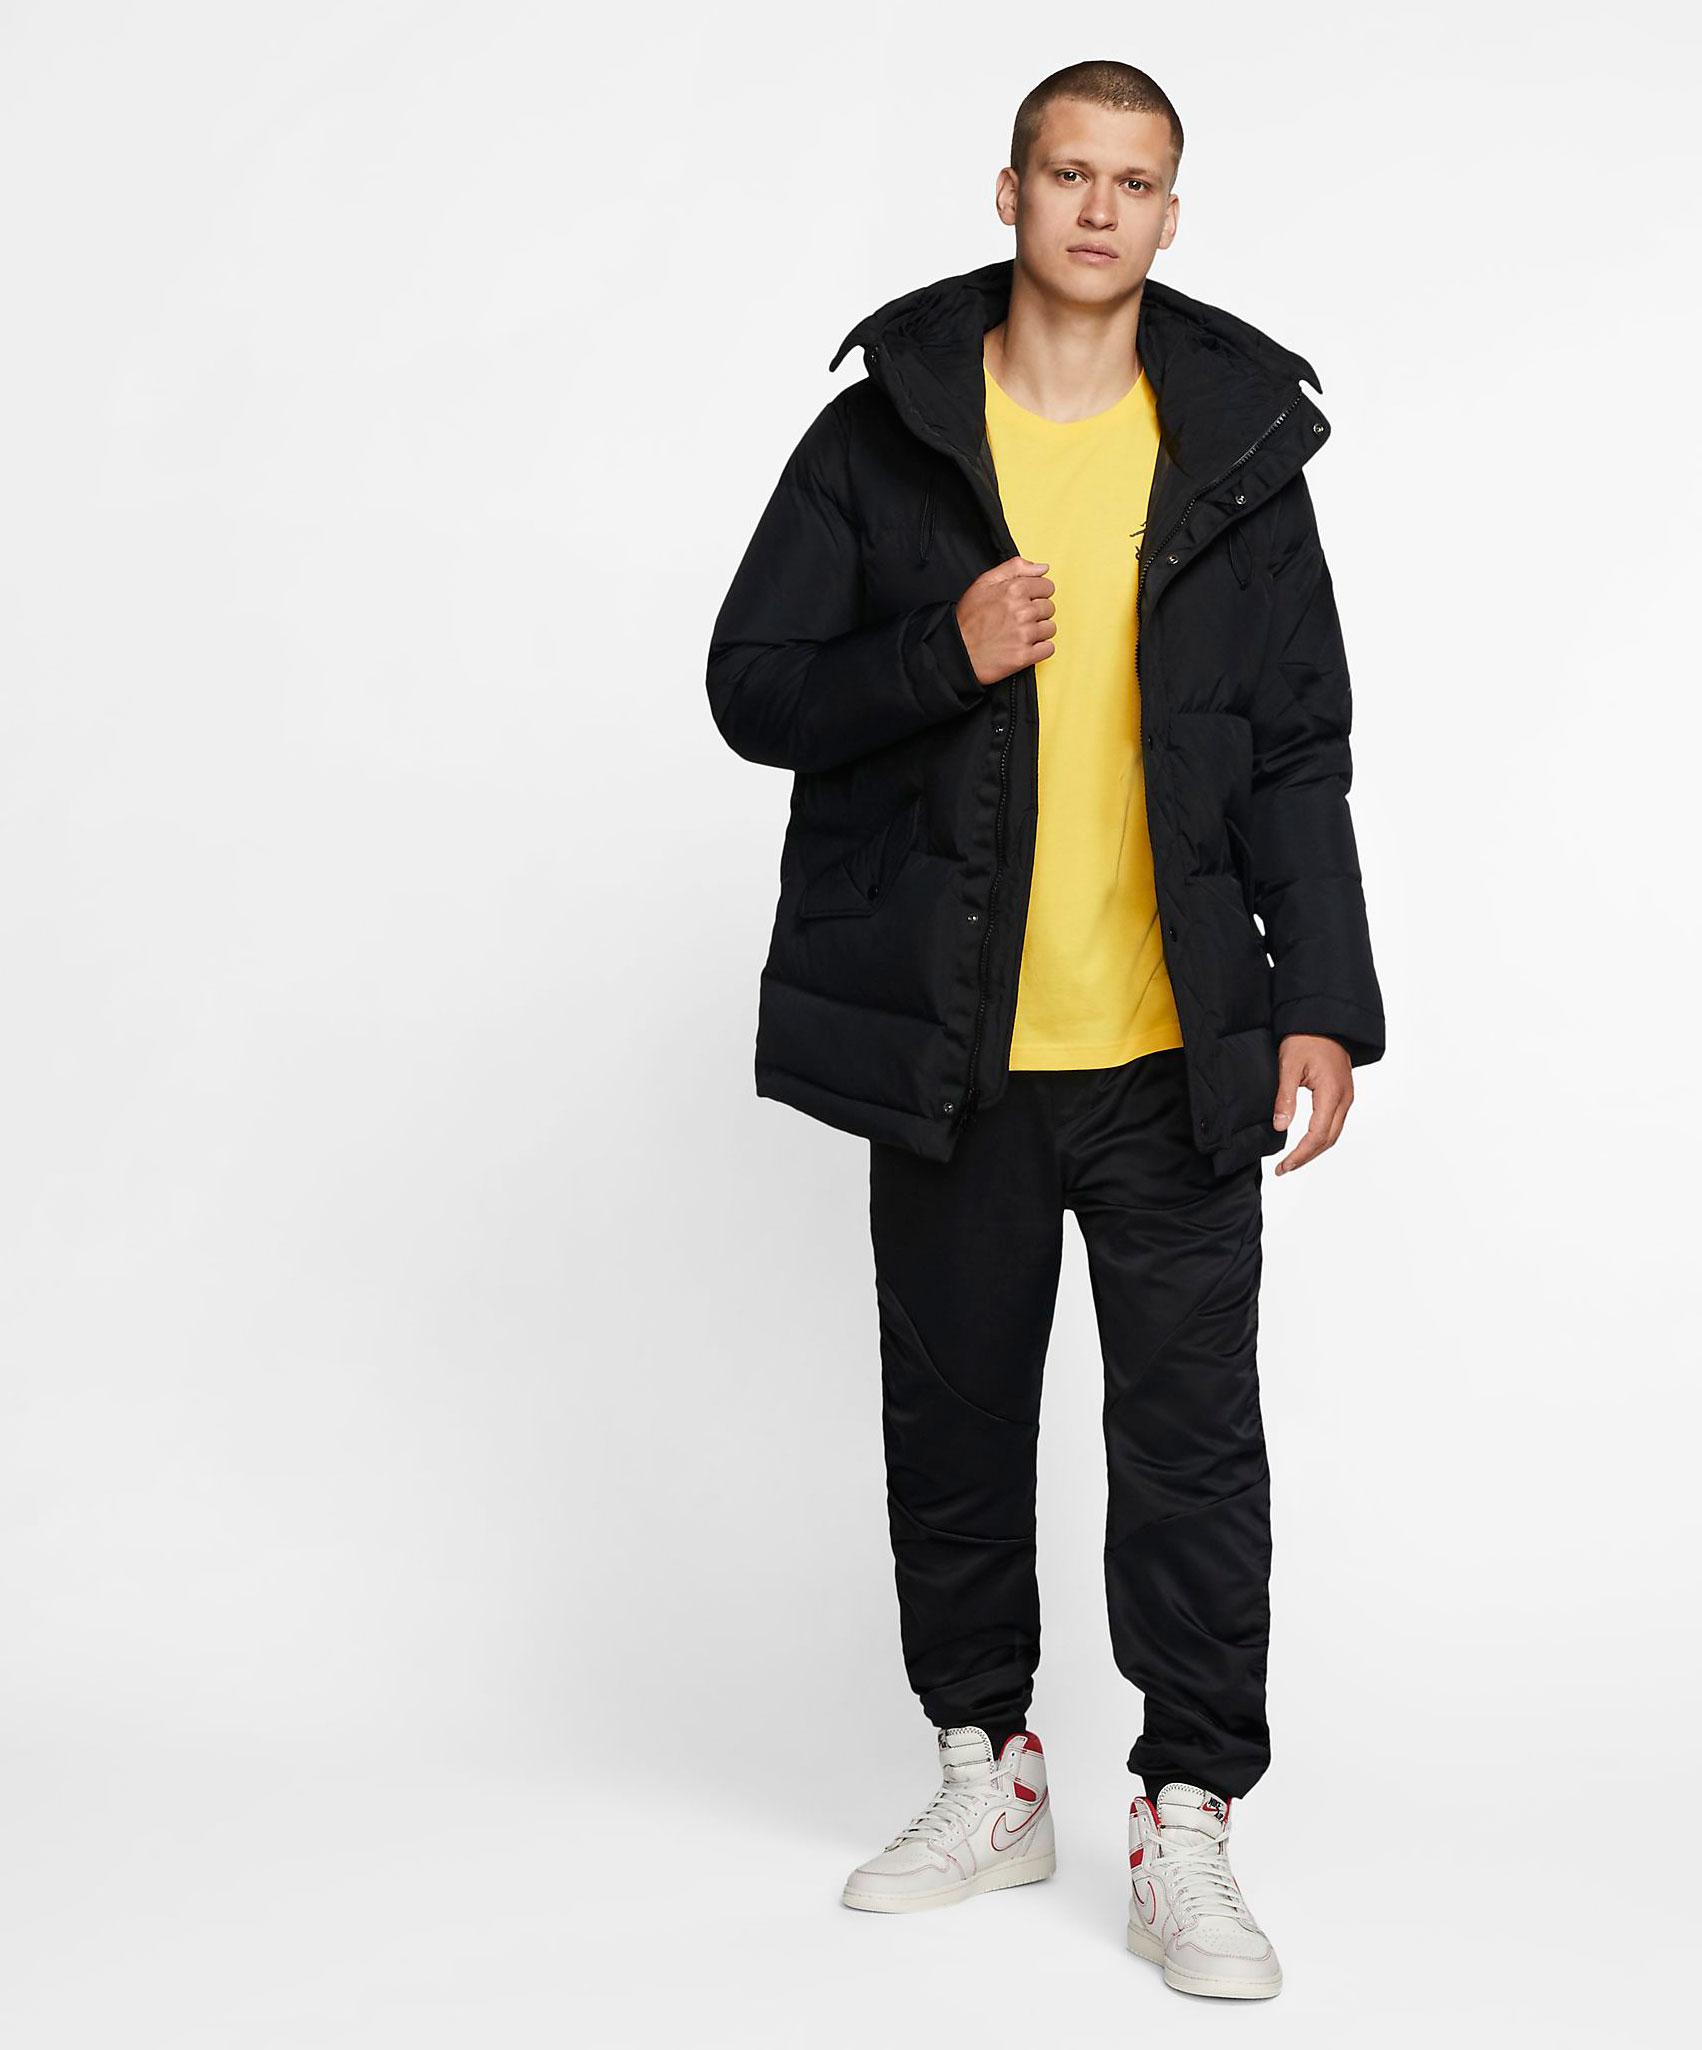 jordan-wings-down-parka-jacket-black-5